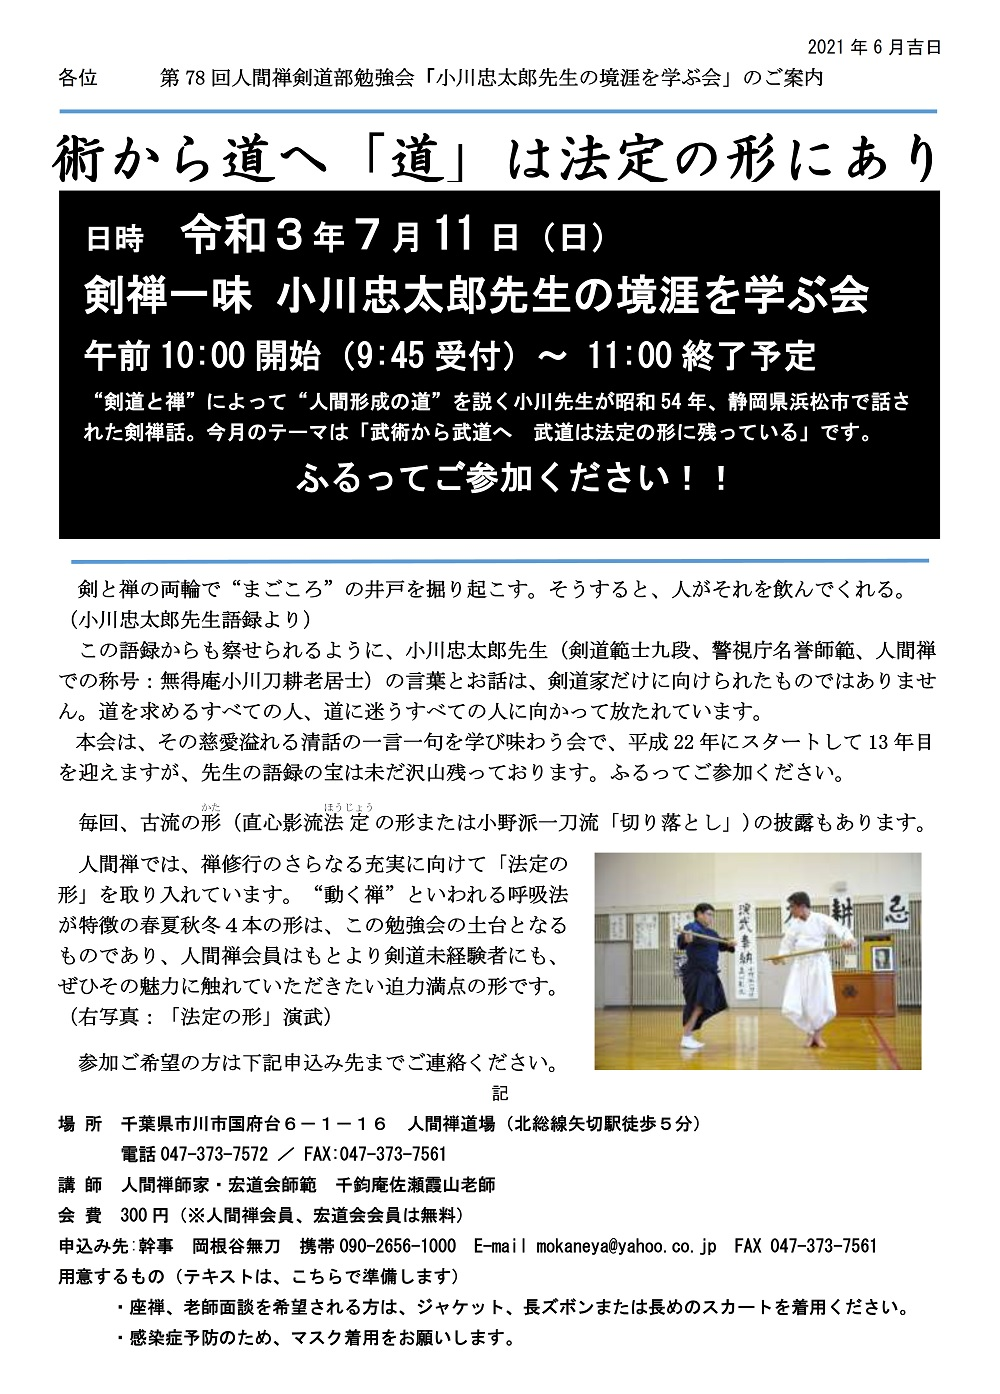 剣書勉強会2021年7月チラシ.jpg